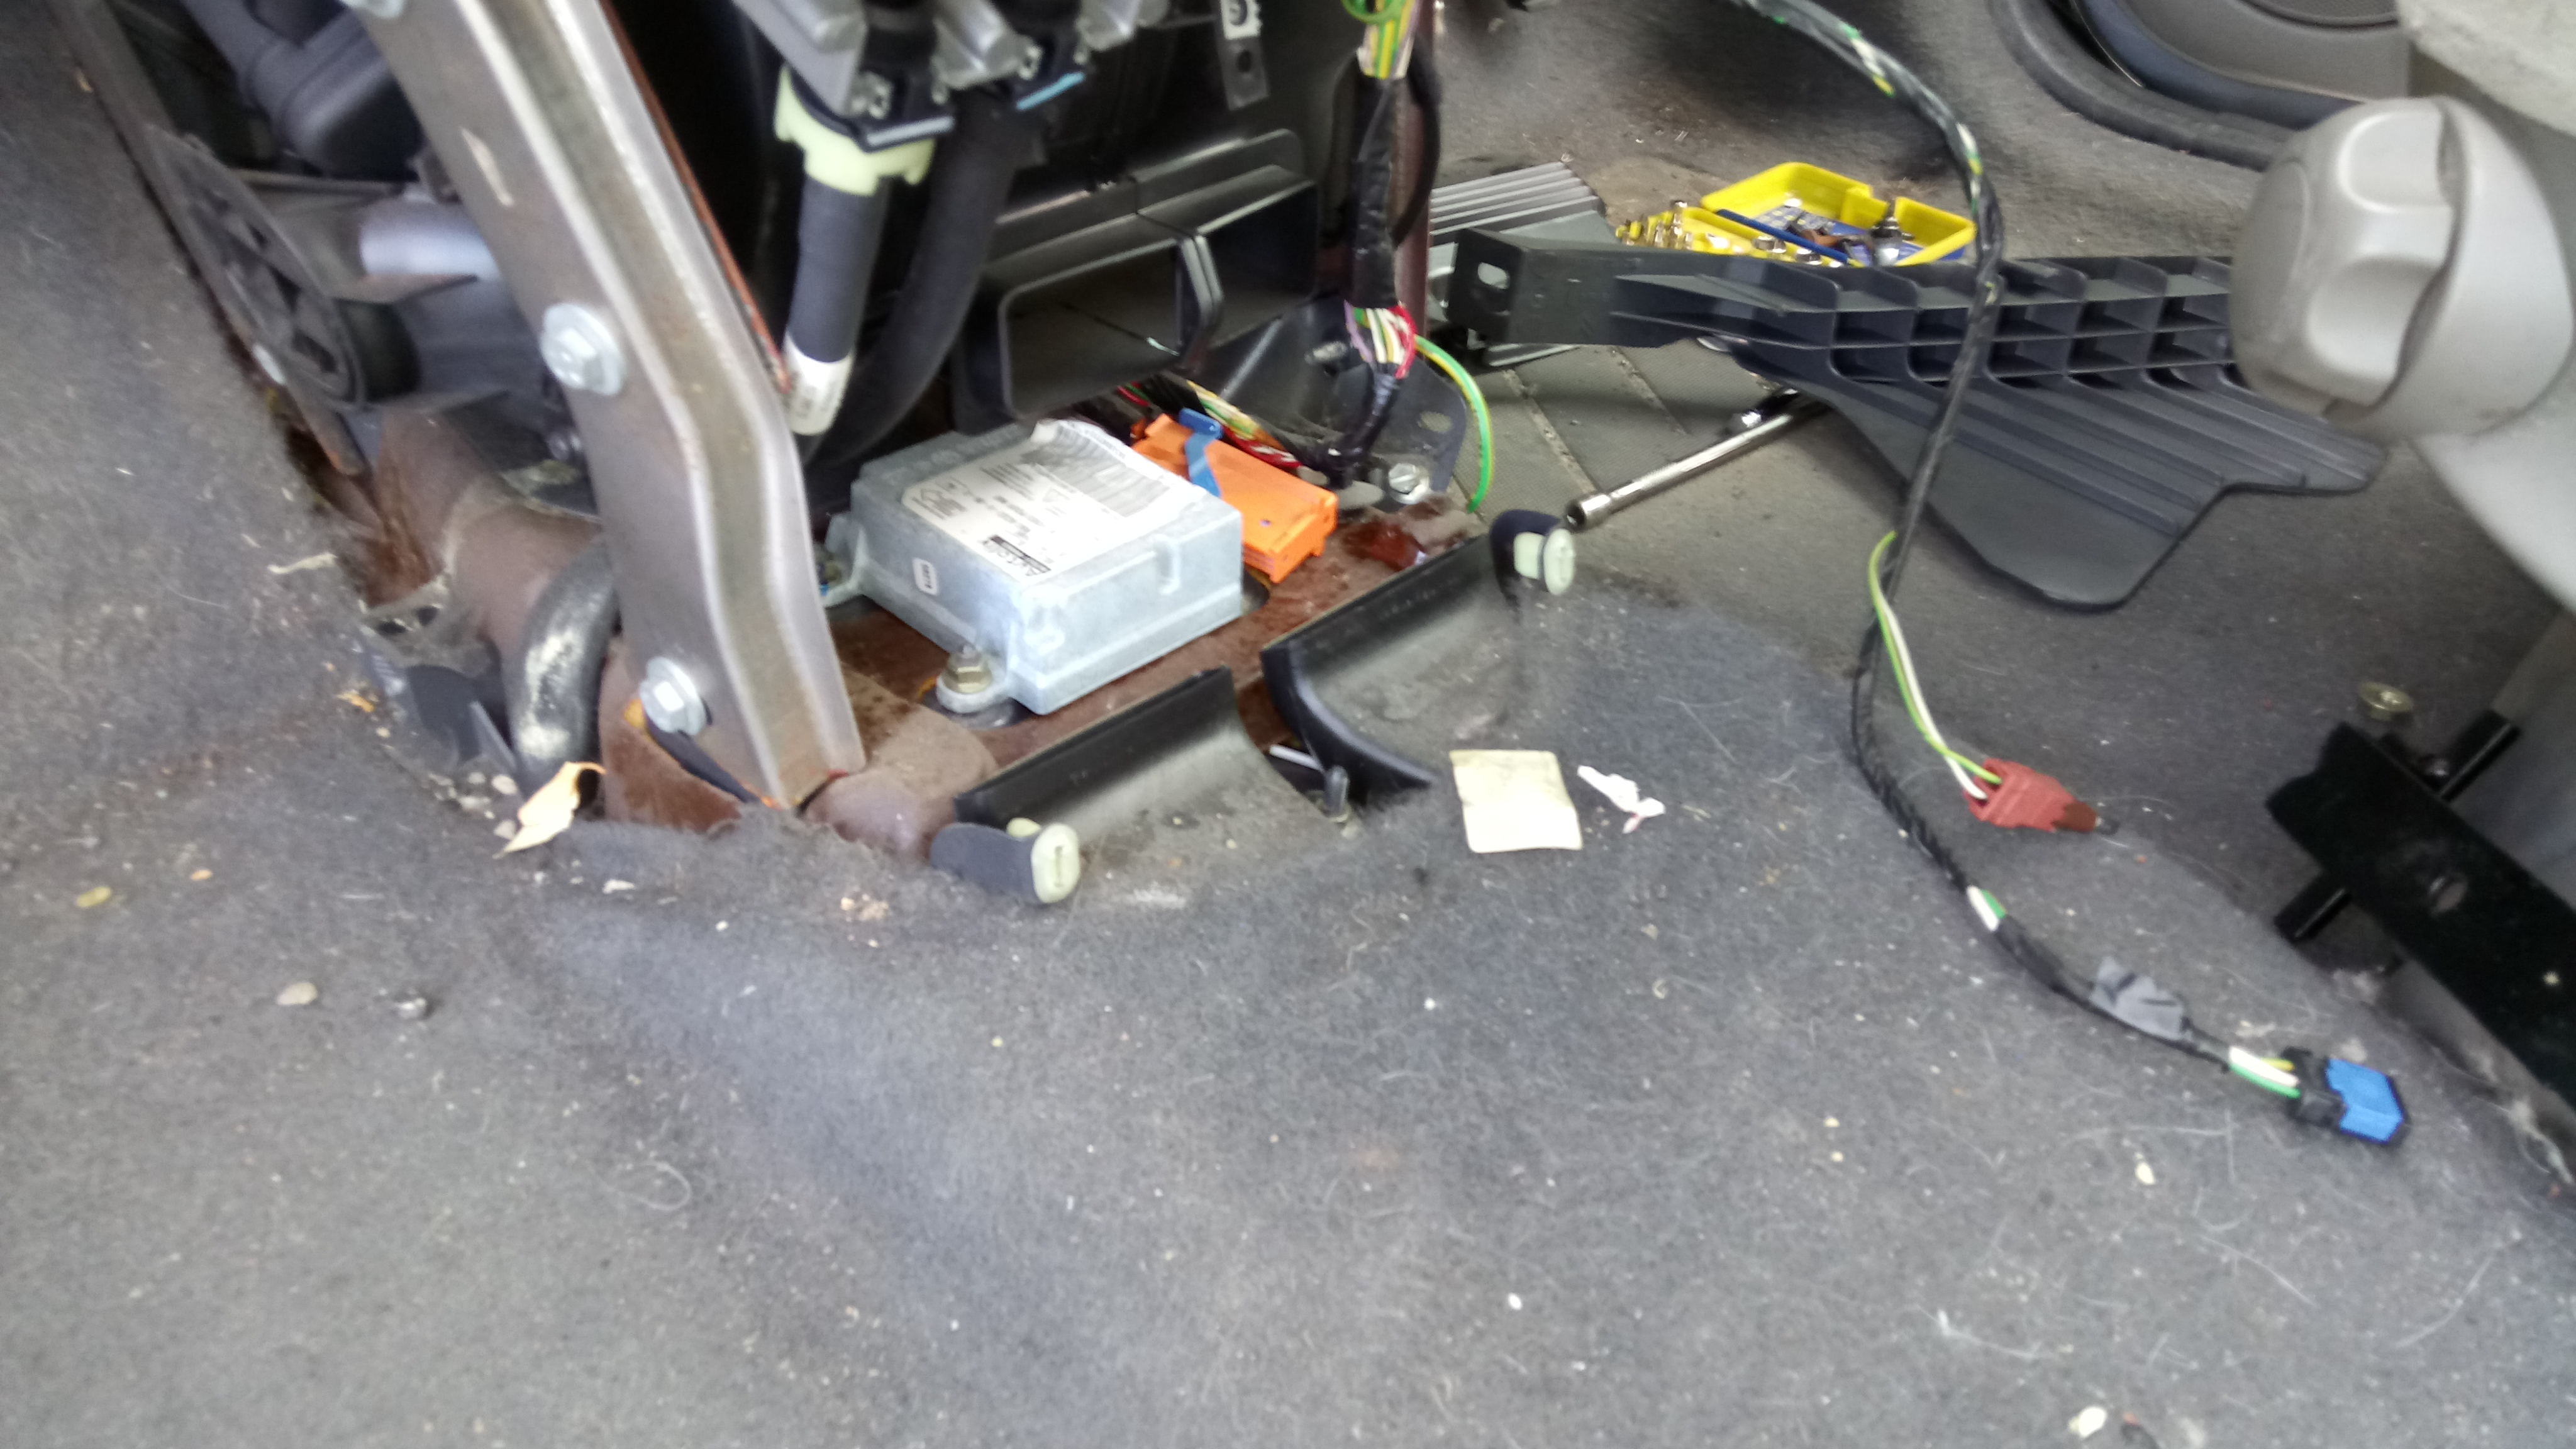 XSARA PICASSO Airbag fault - Car Electrics & Repairs